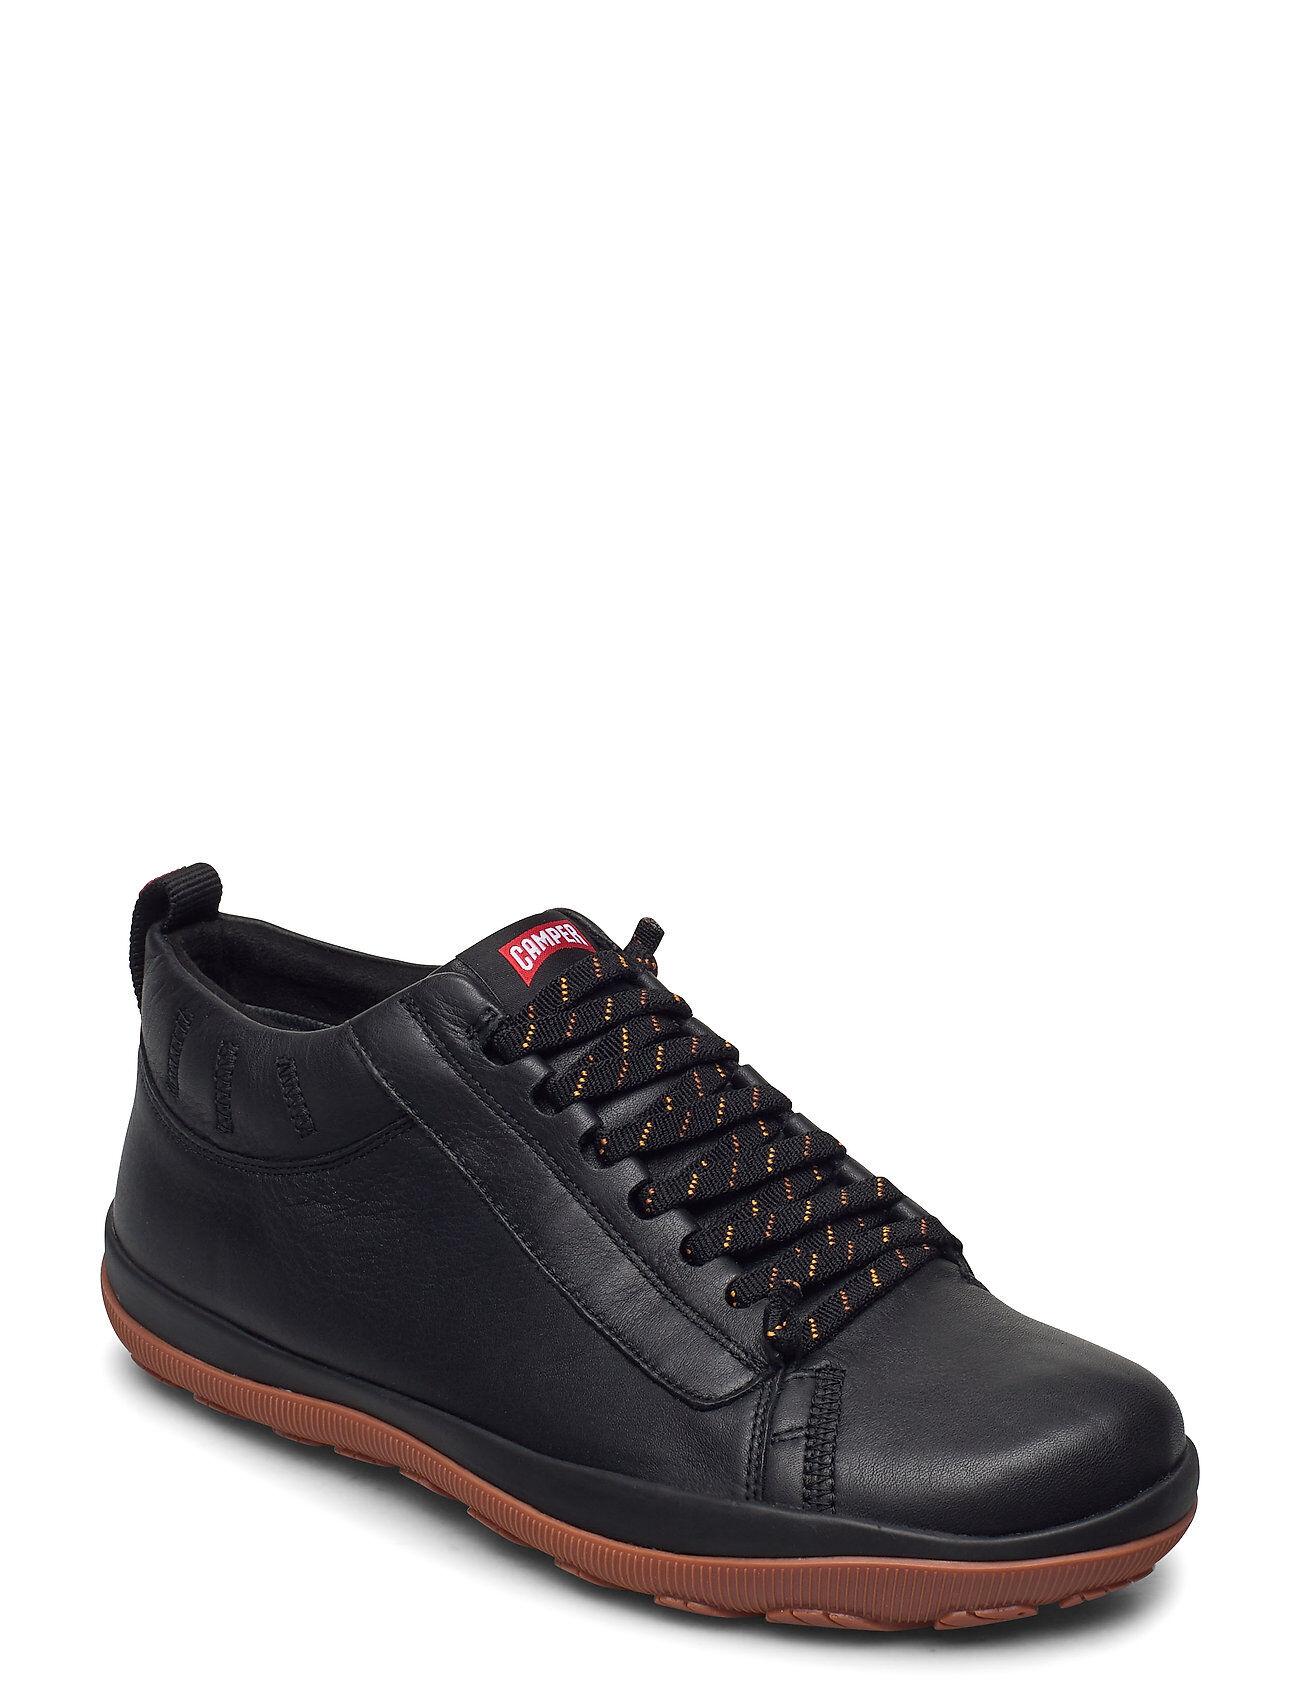 Camper Peu Pista Gm Matalavartiset Sneakerit Tennarit Musta